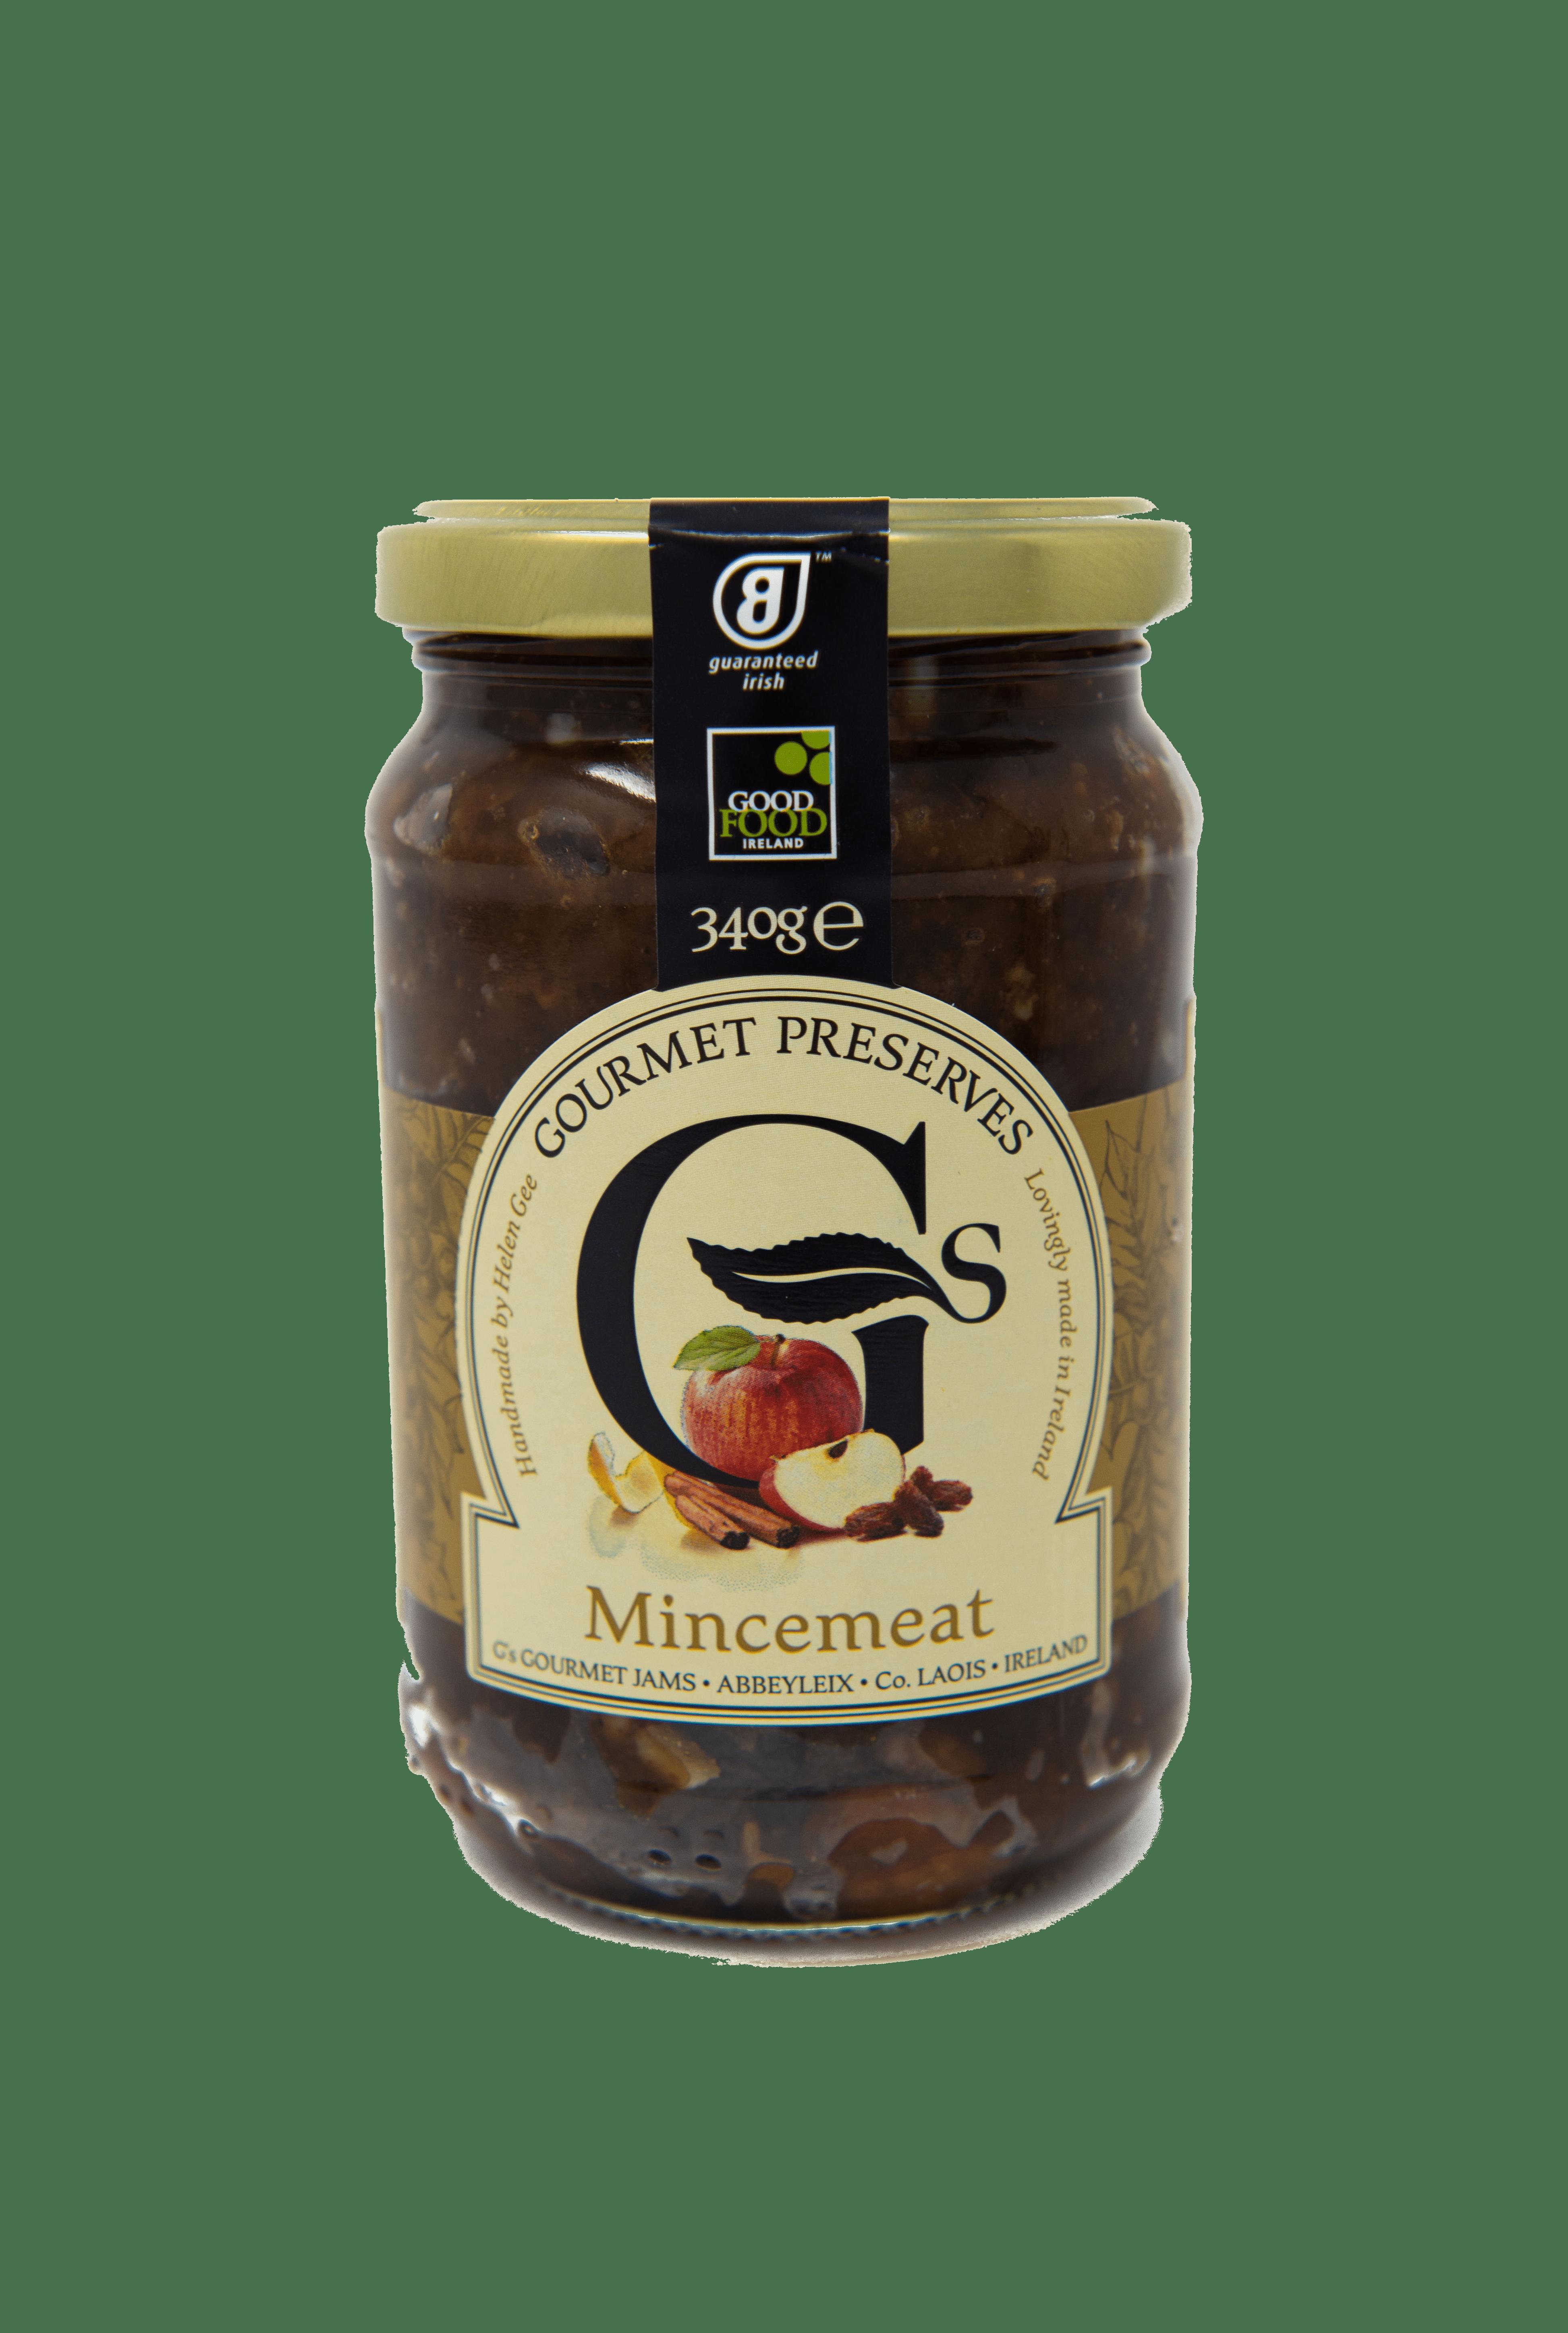 Mincemeat Image